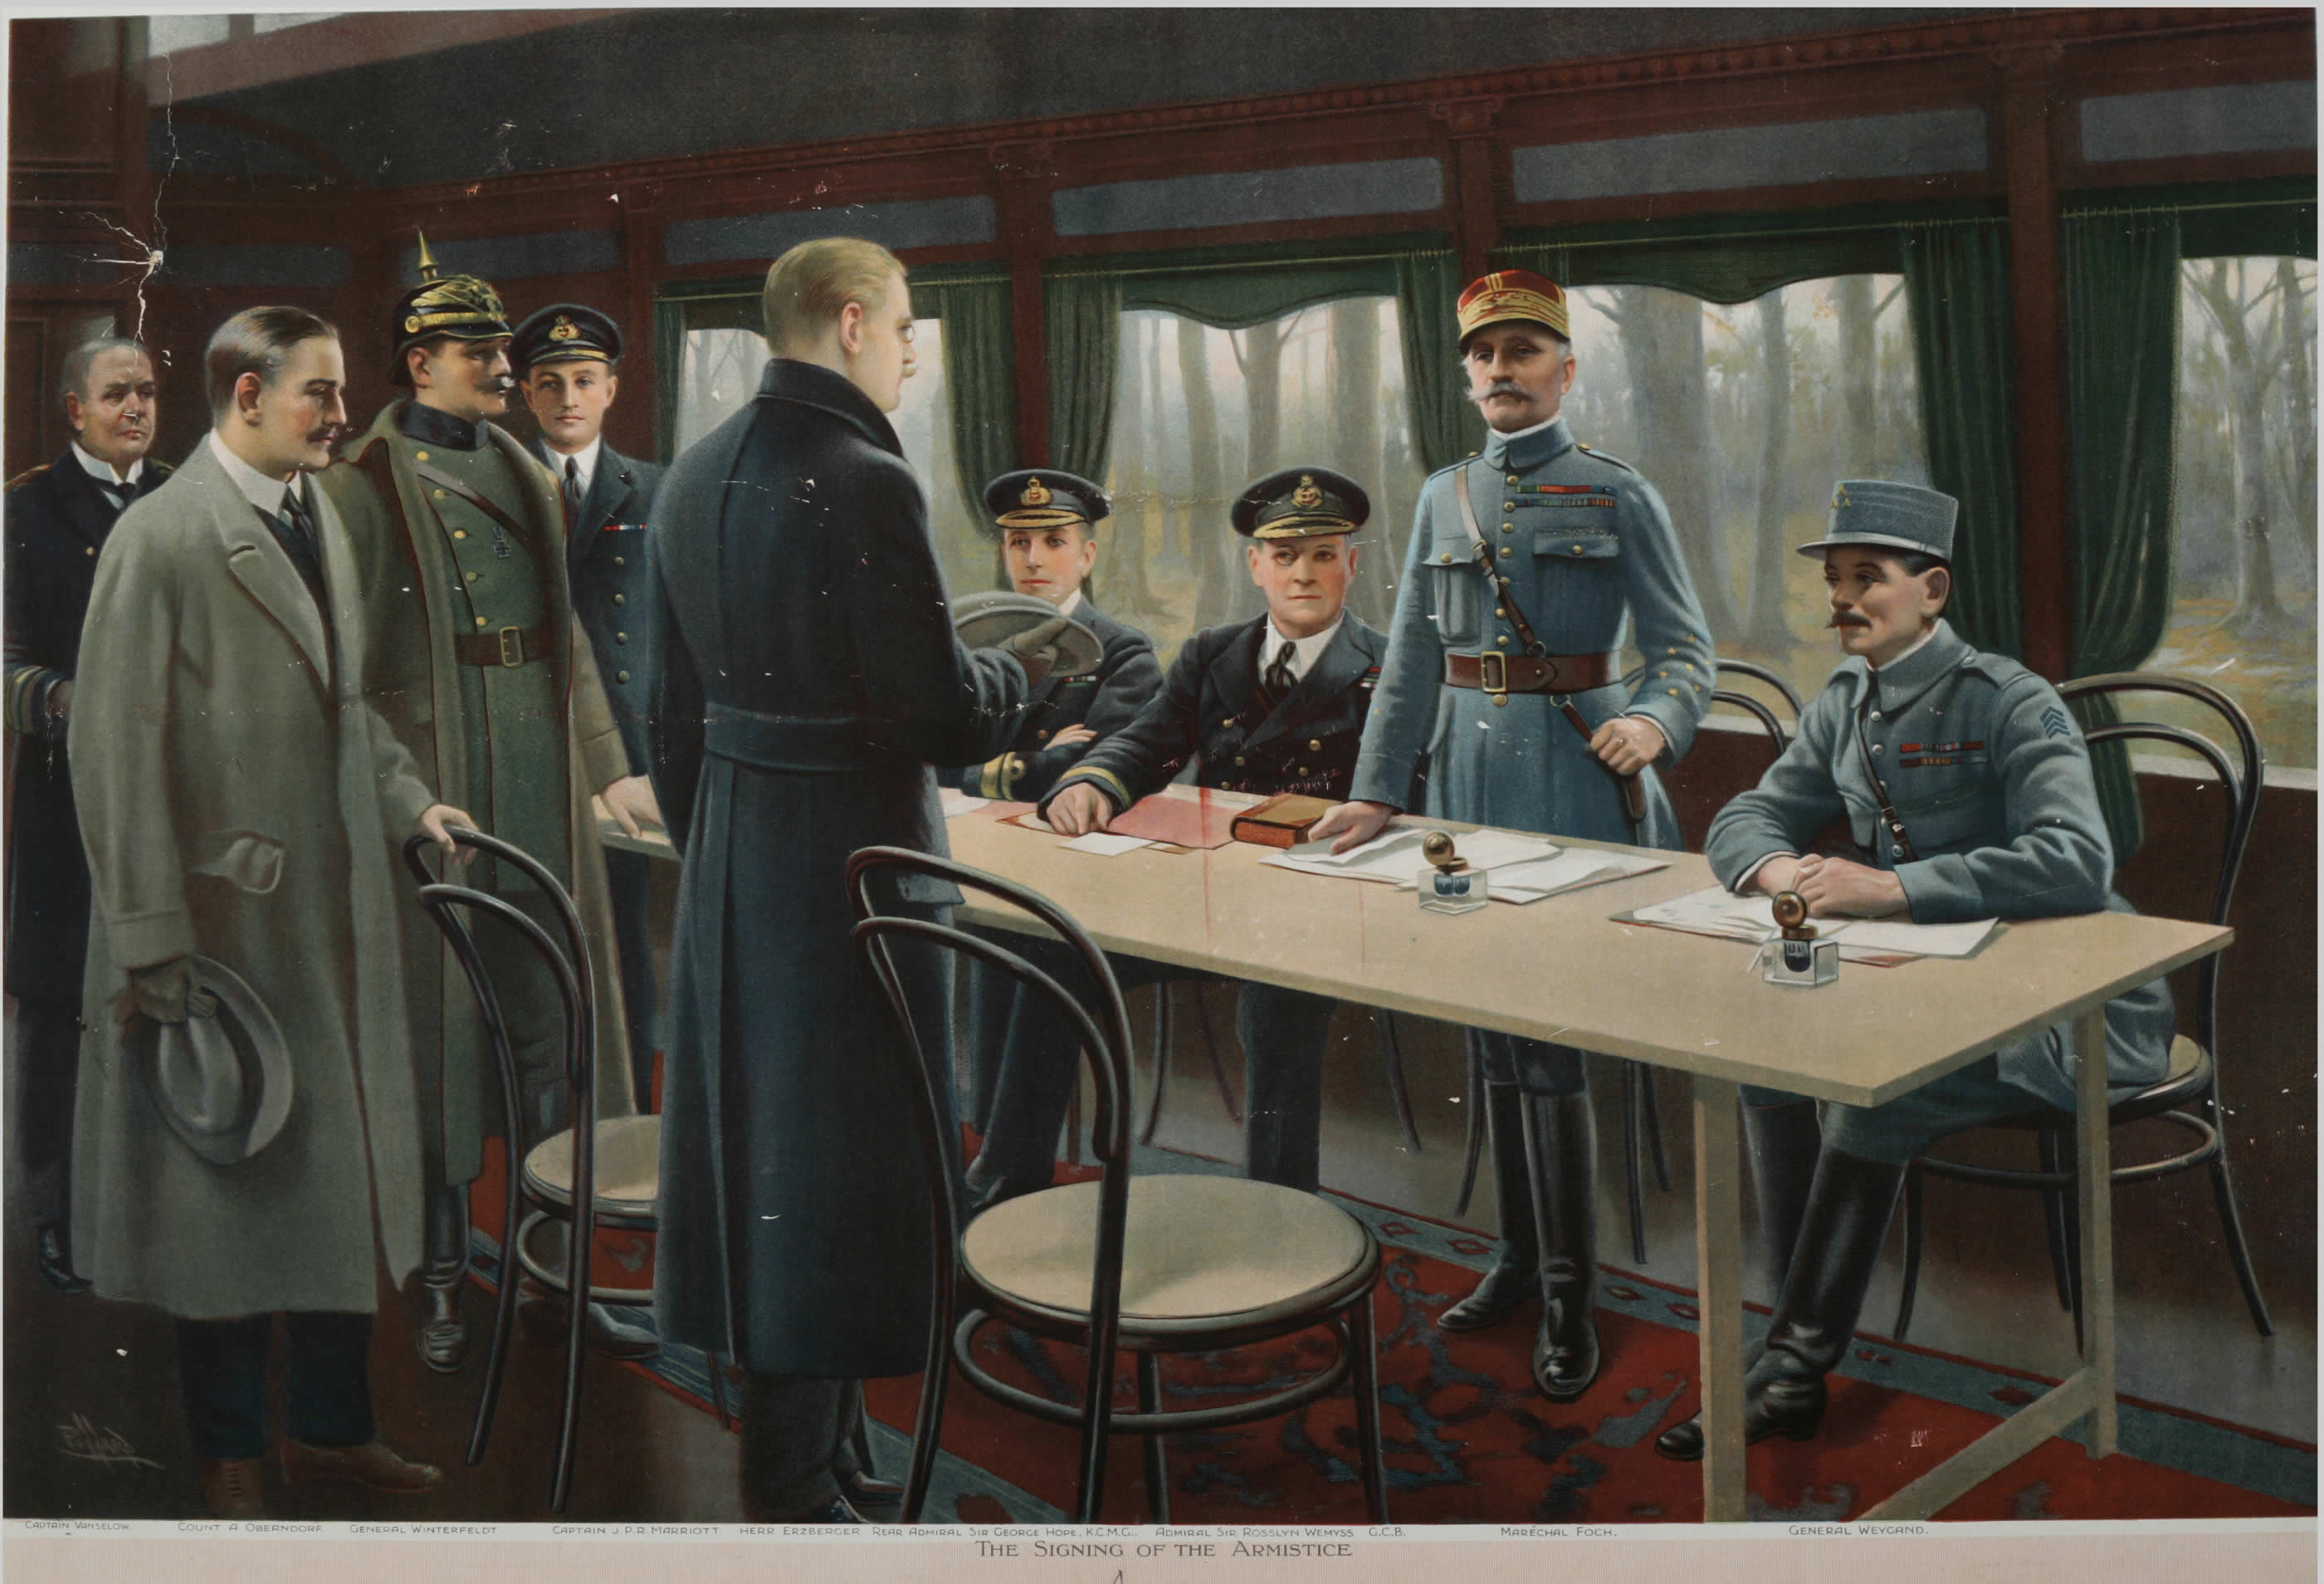 Armistice, November 1918